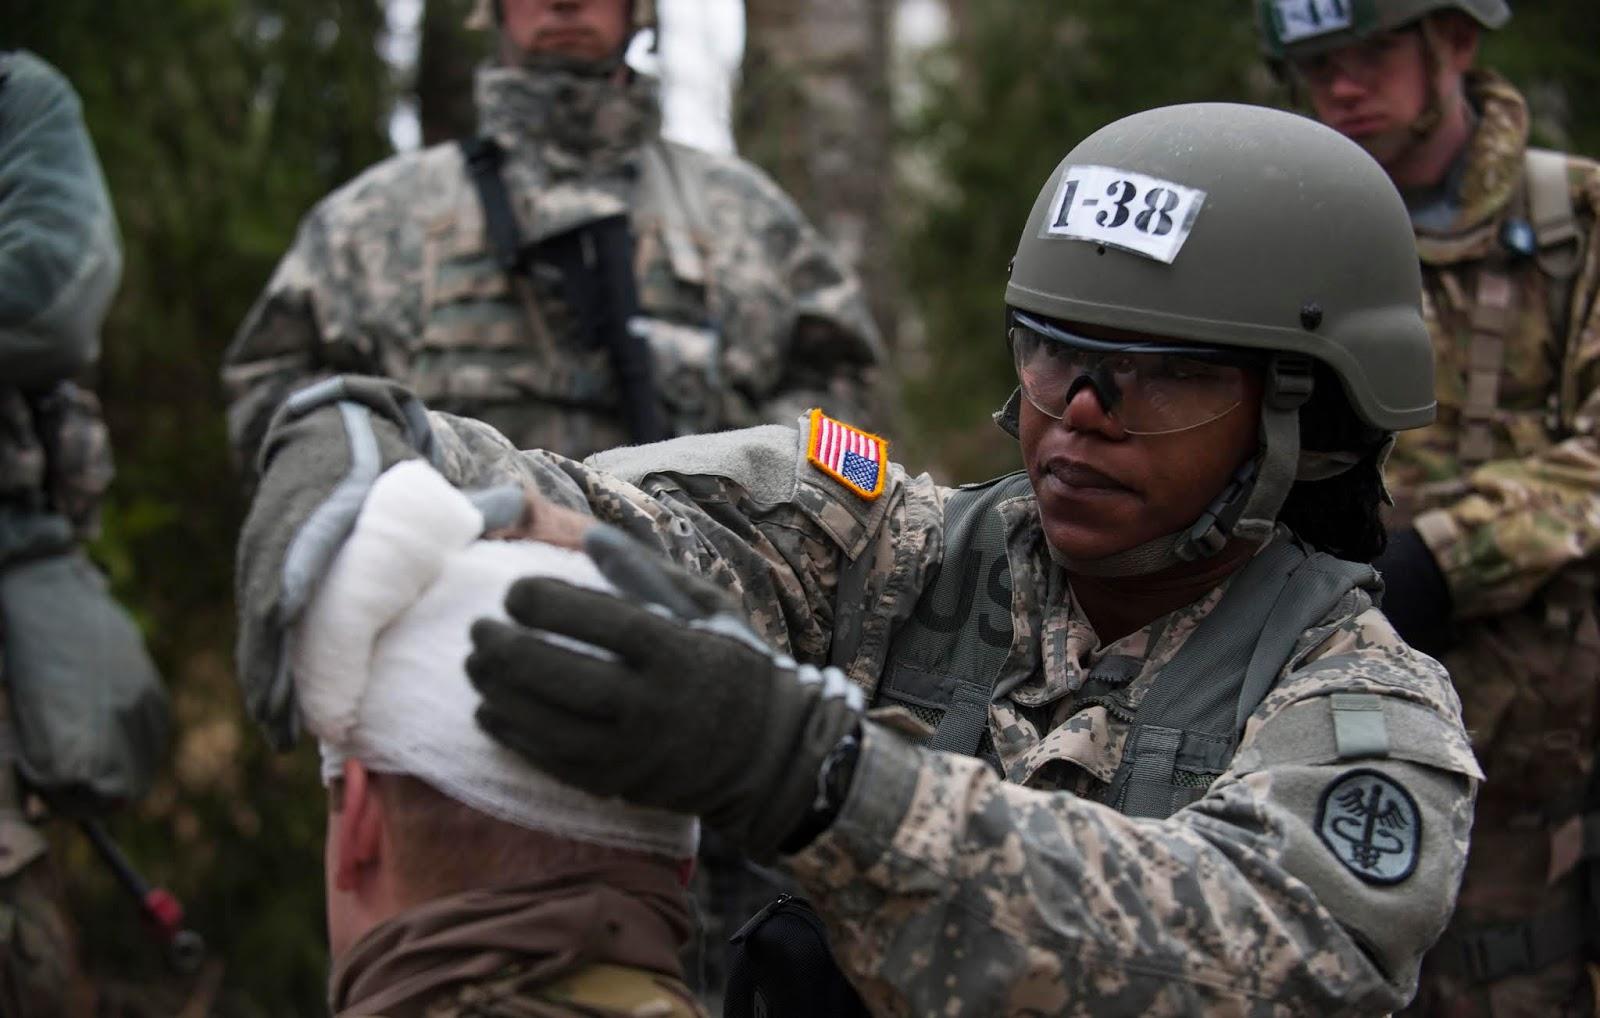 woman soldier bandaging a man's head